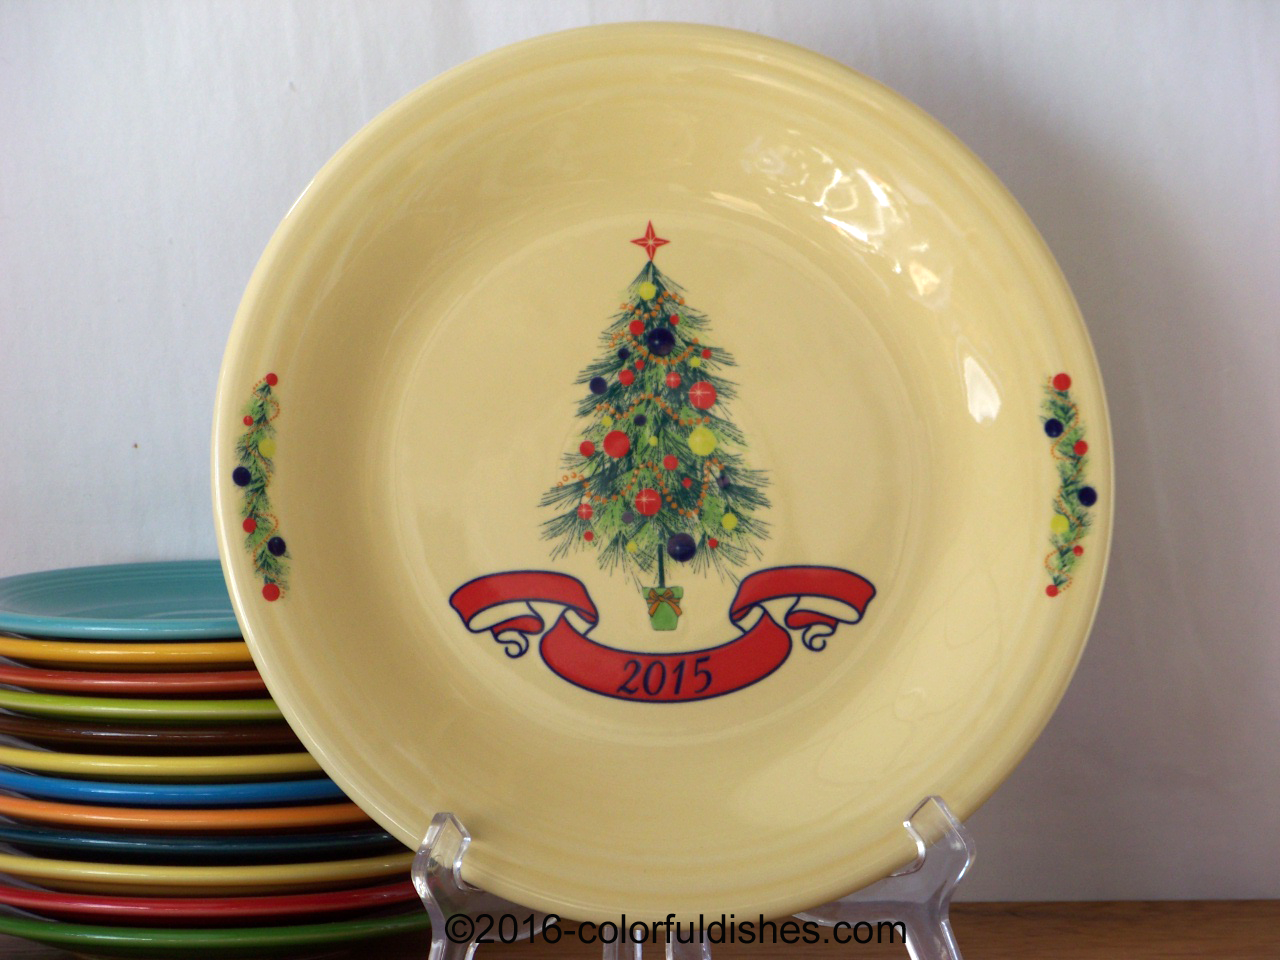 Dillard\u0027s 2015 Fiesta® Christmas Tree Plate & Yearly Christmas Tree - Post 86 Reference Guide